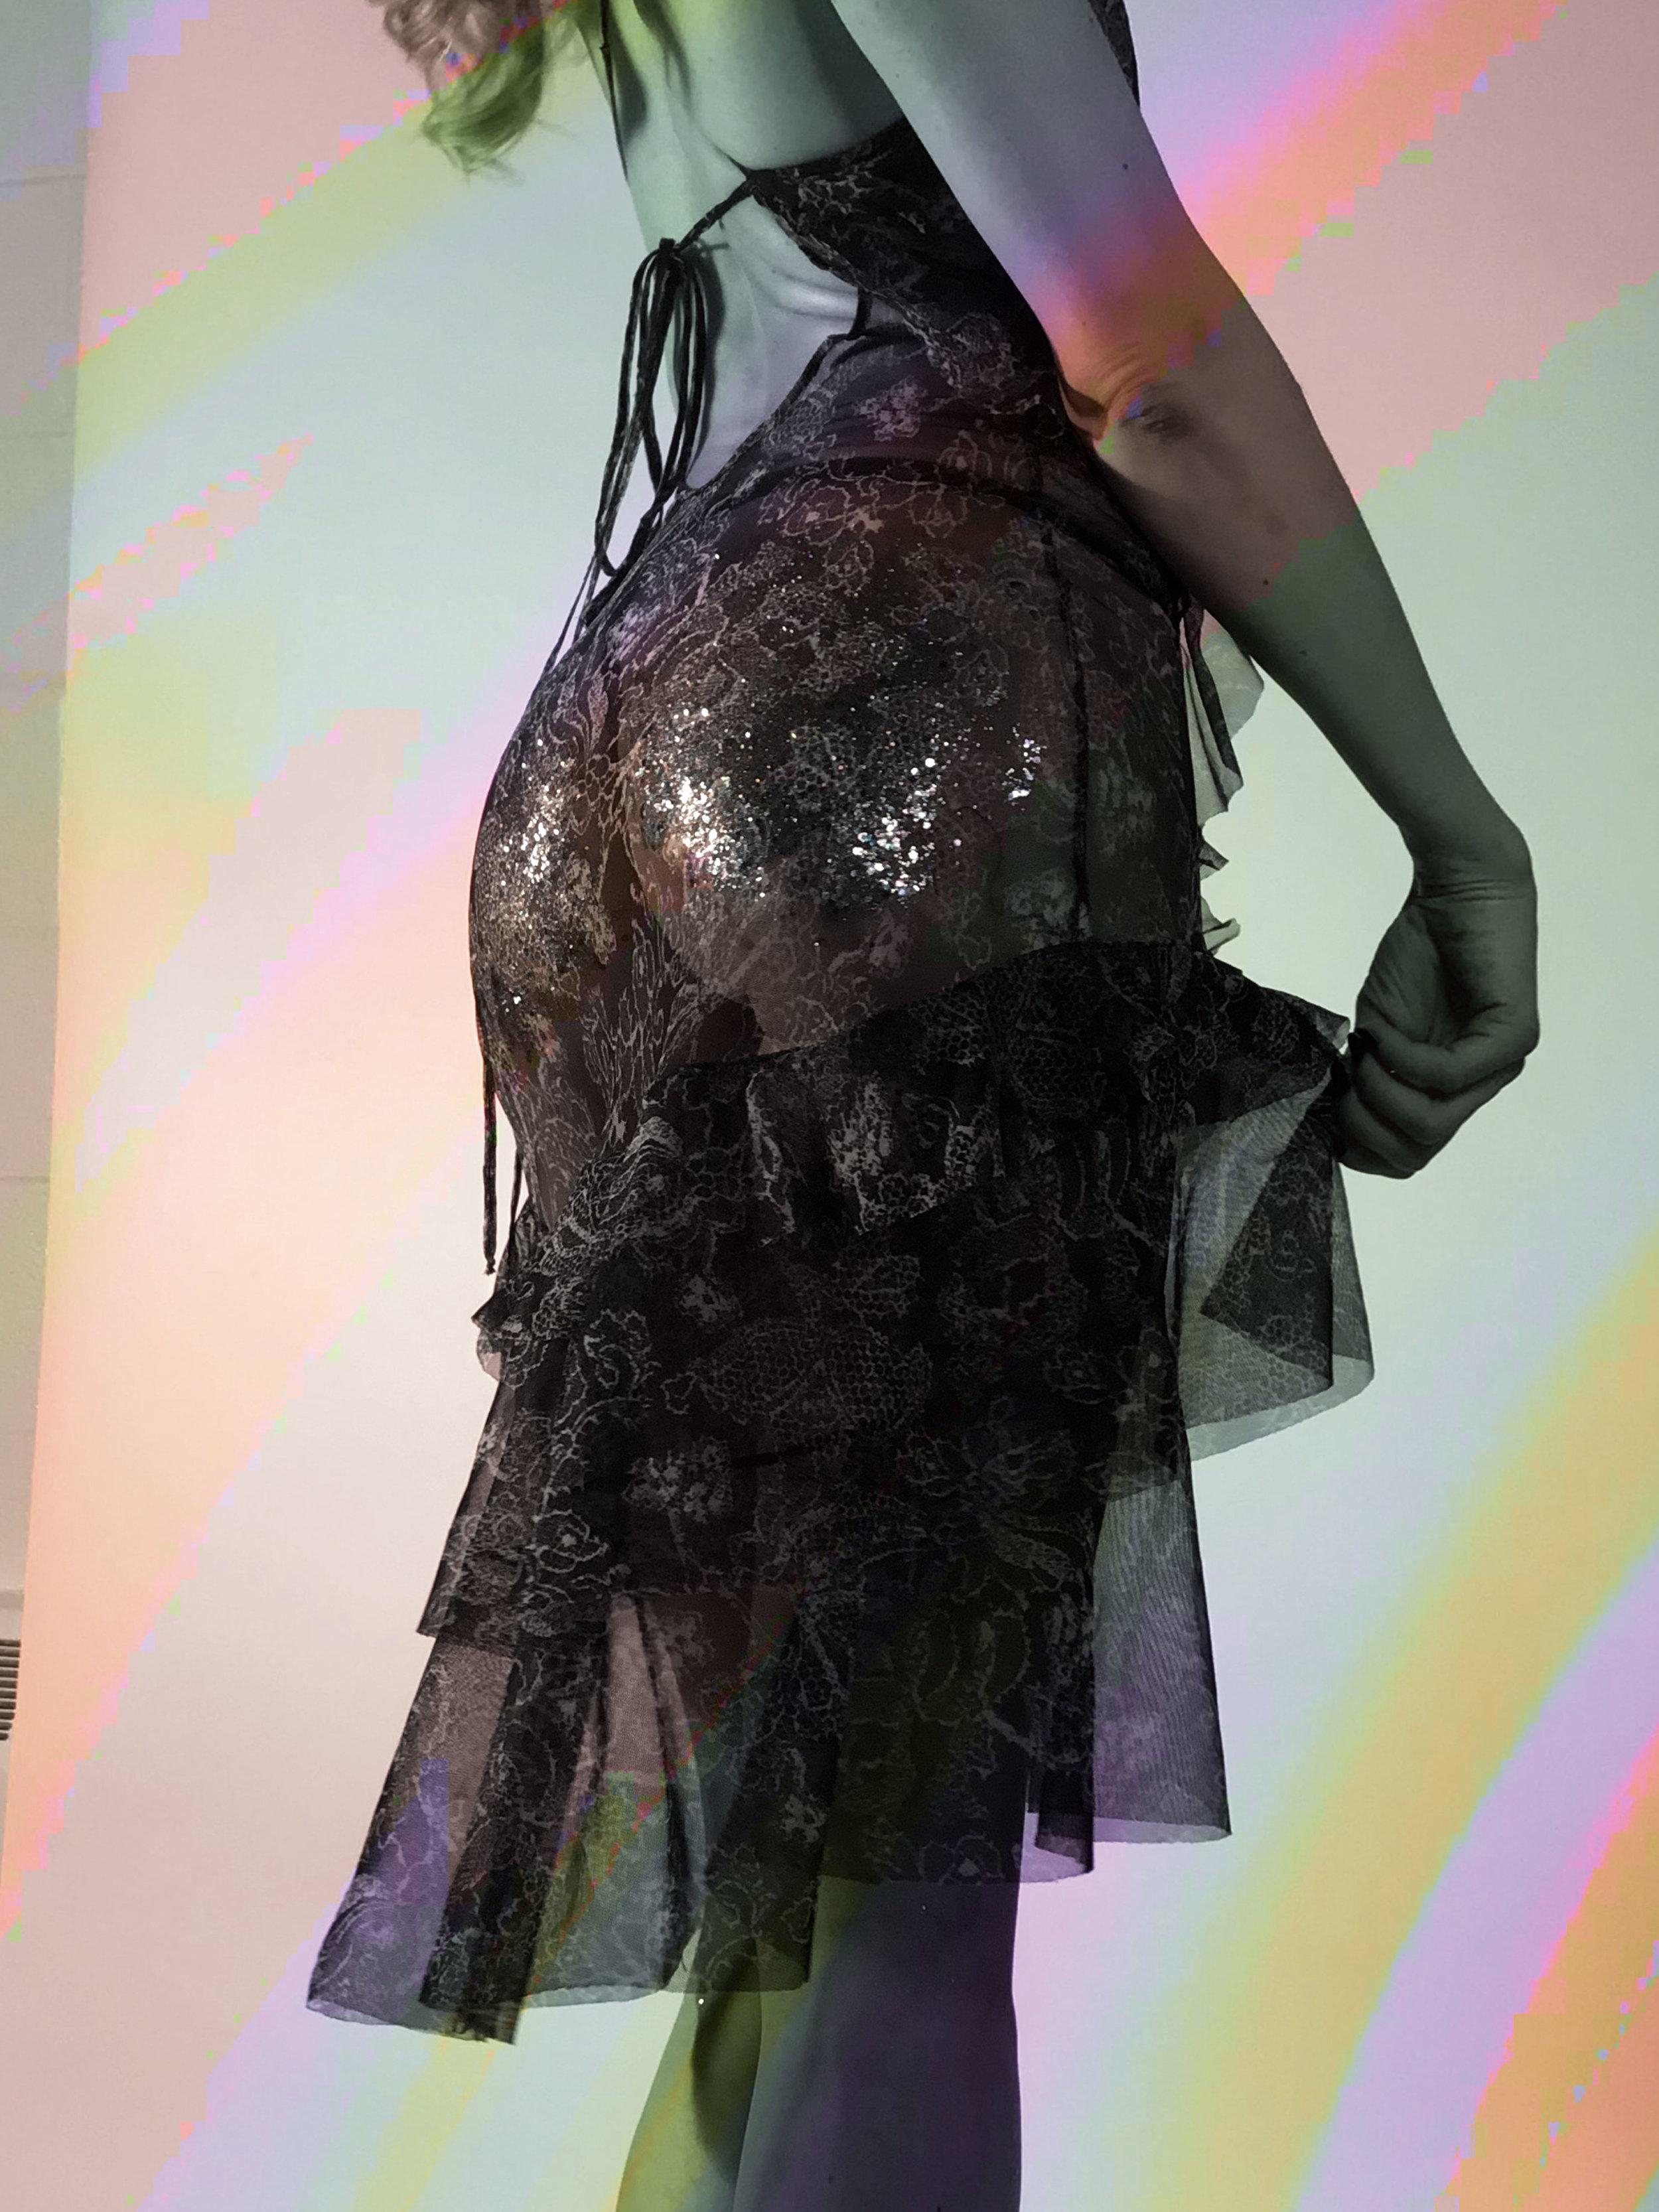 EVVOOSHKA, Allison Laakko, retro vibes, fashion photography SS18